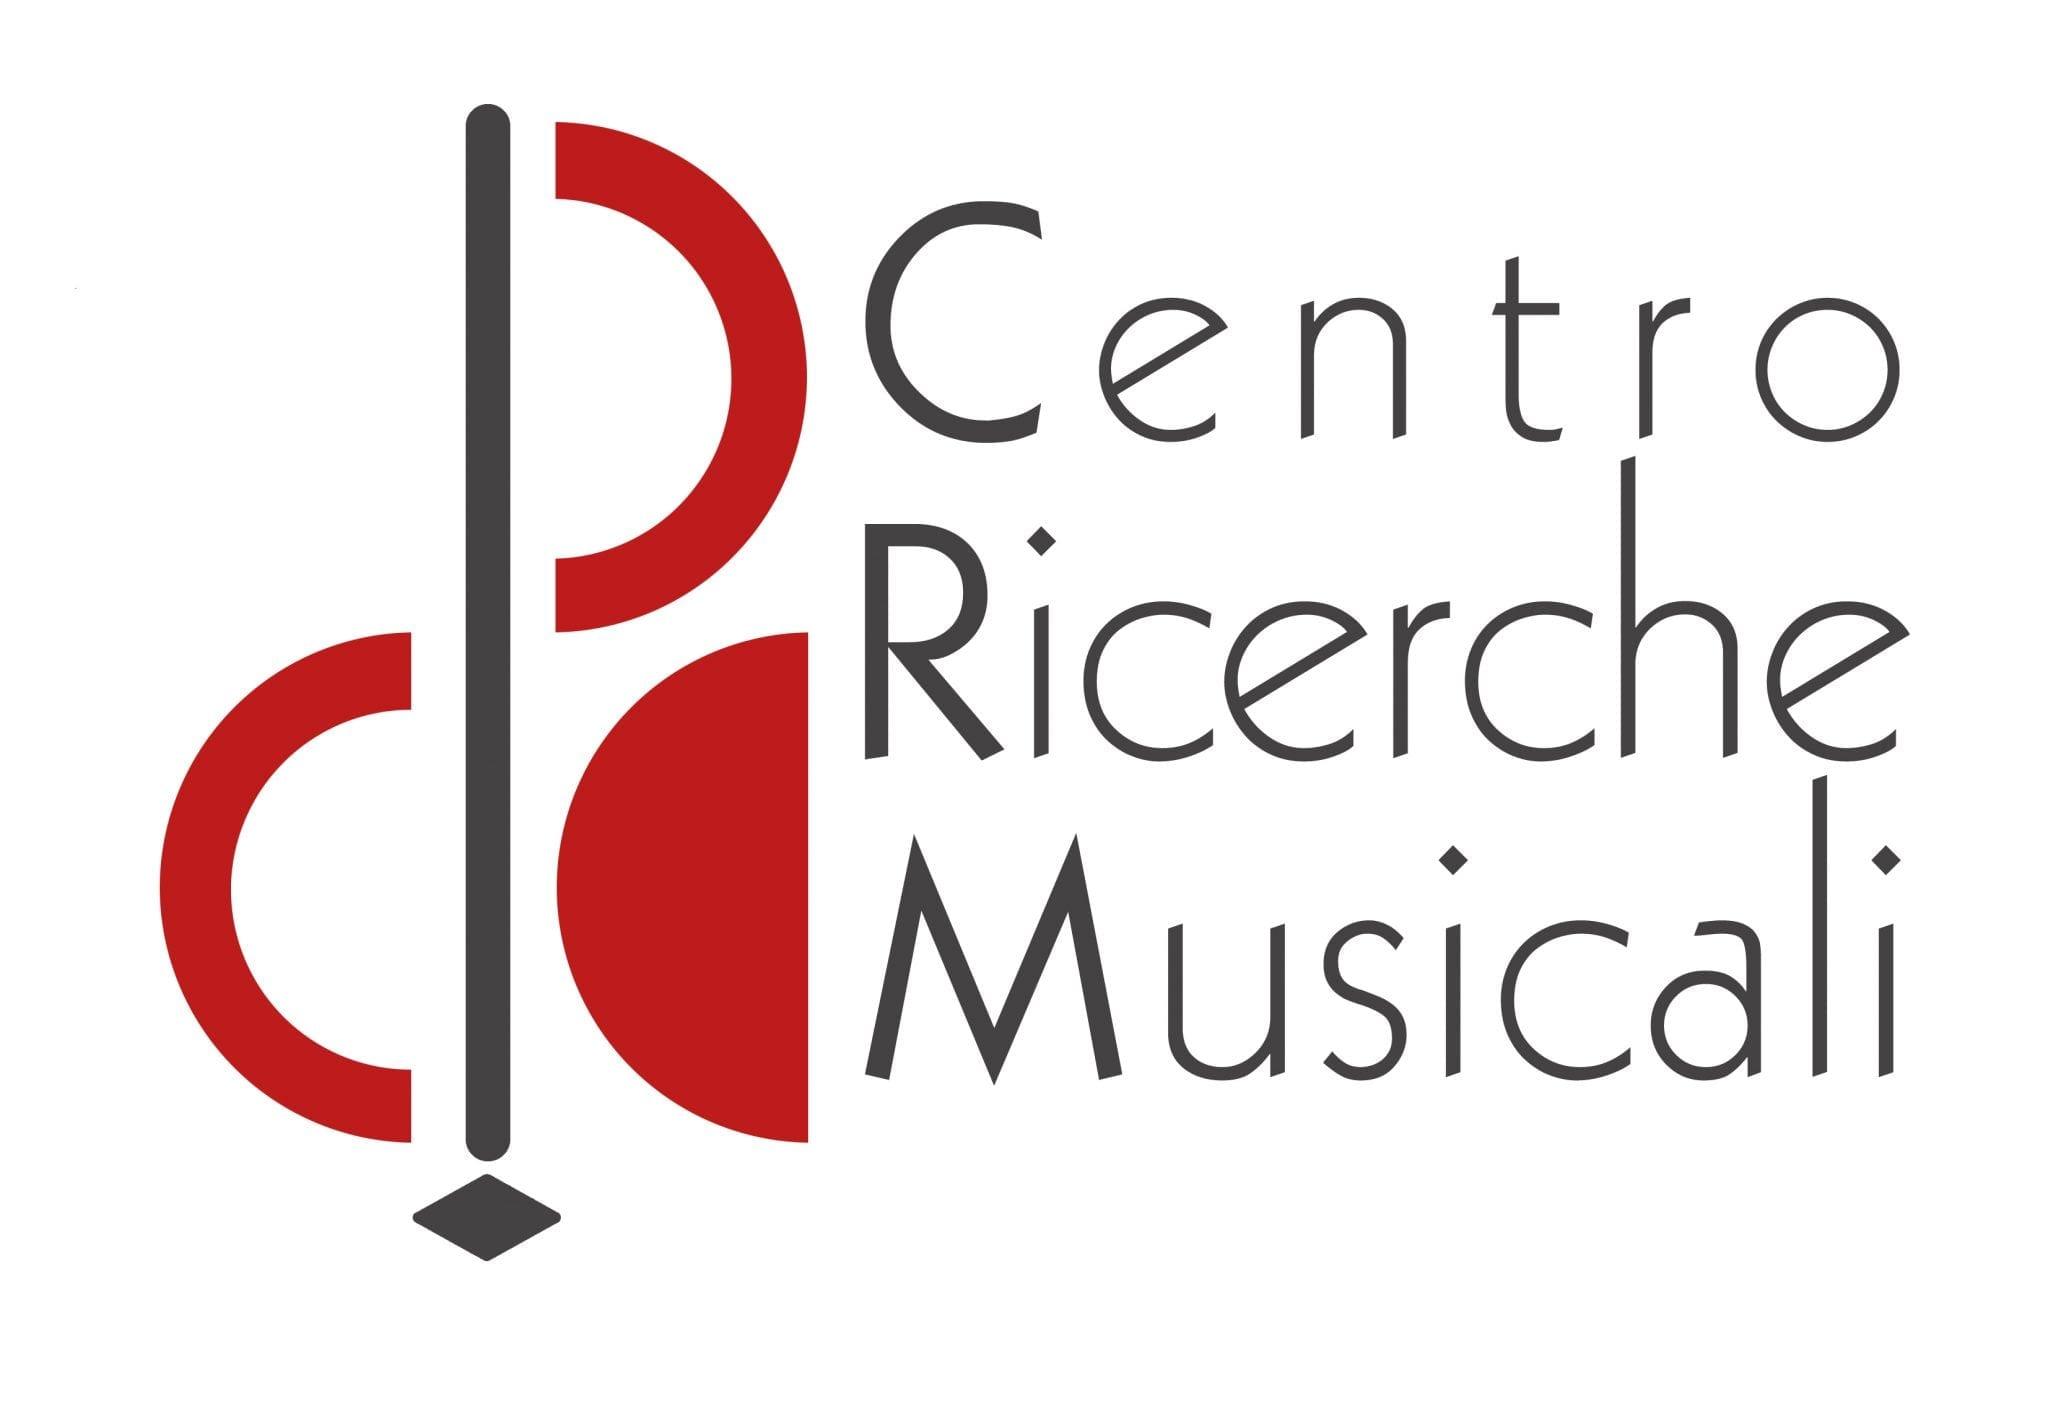 crm_logo1